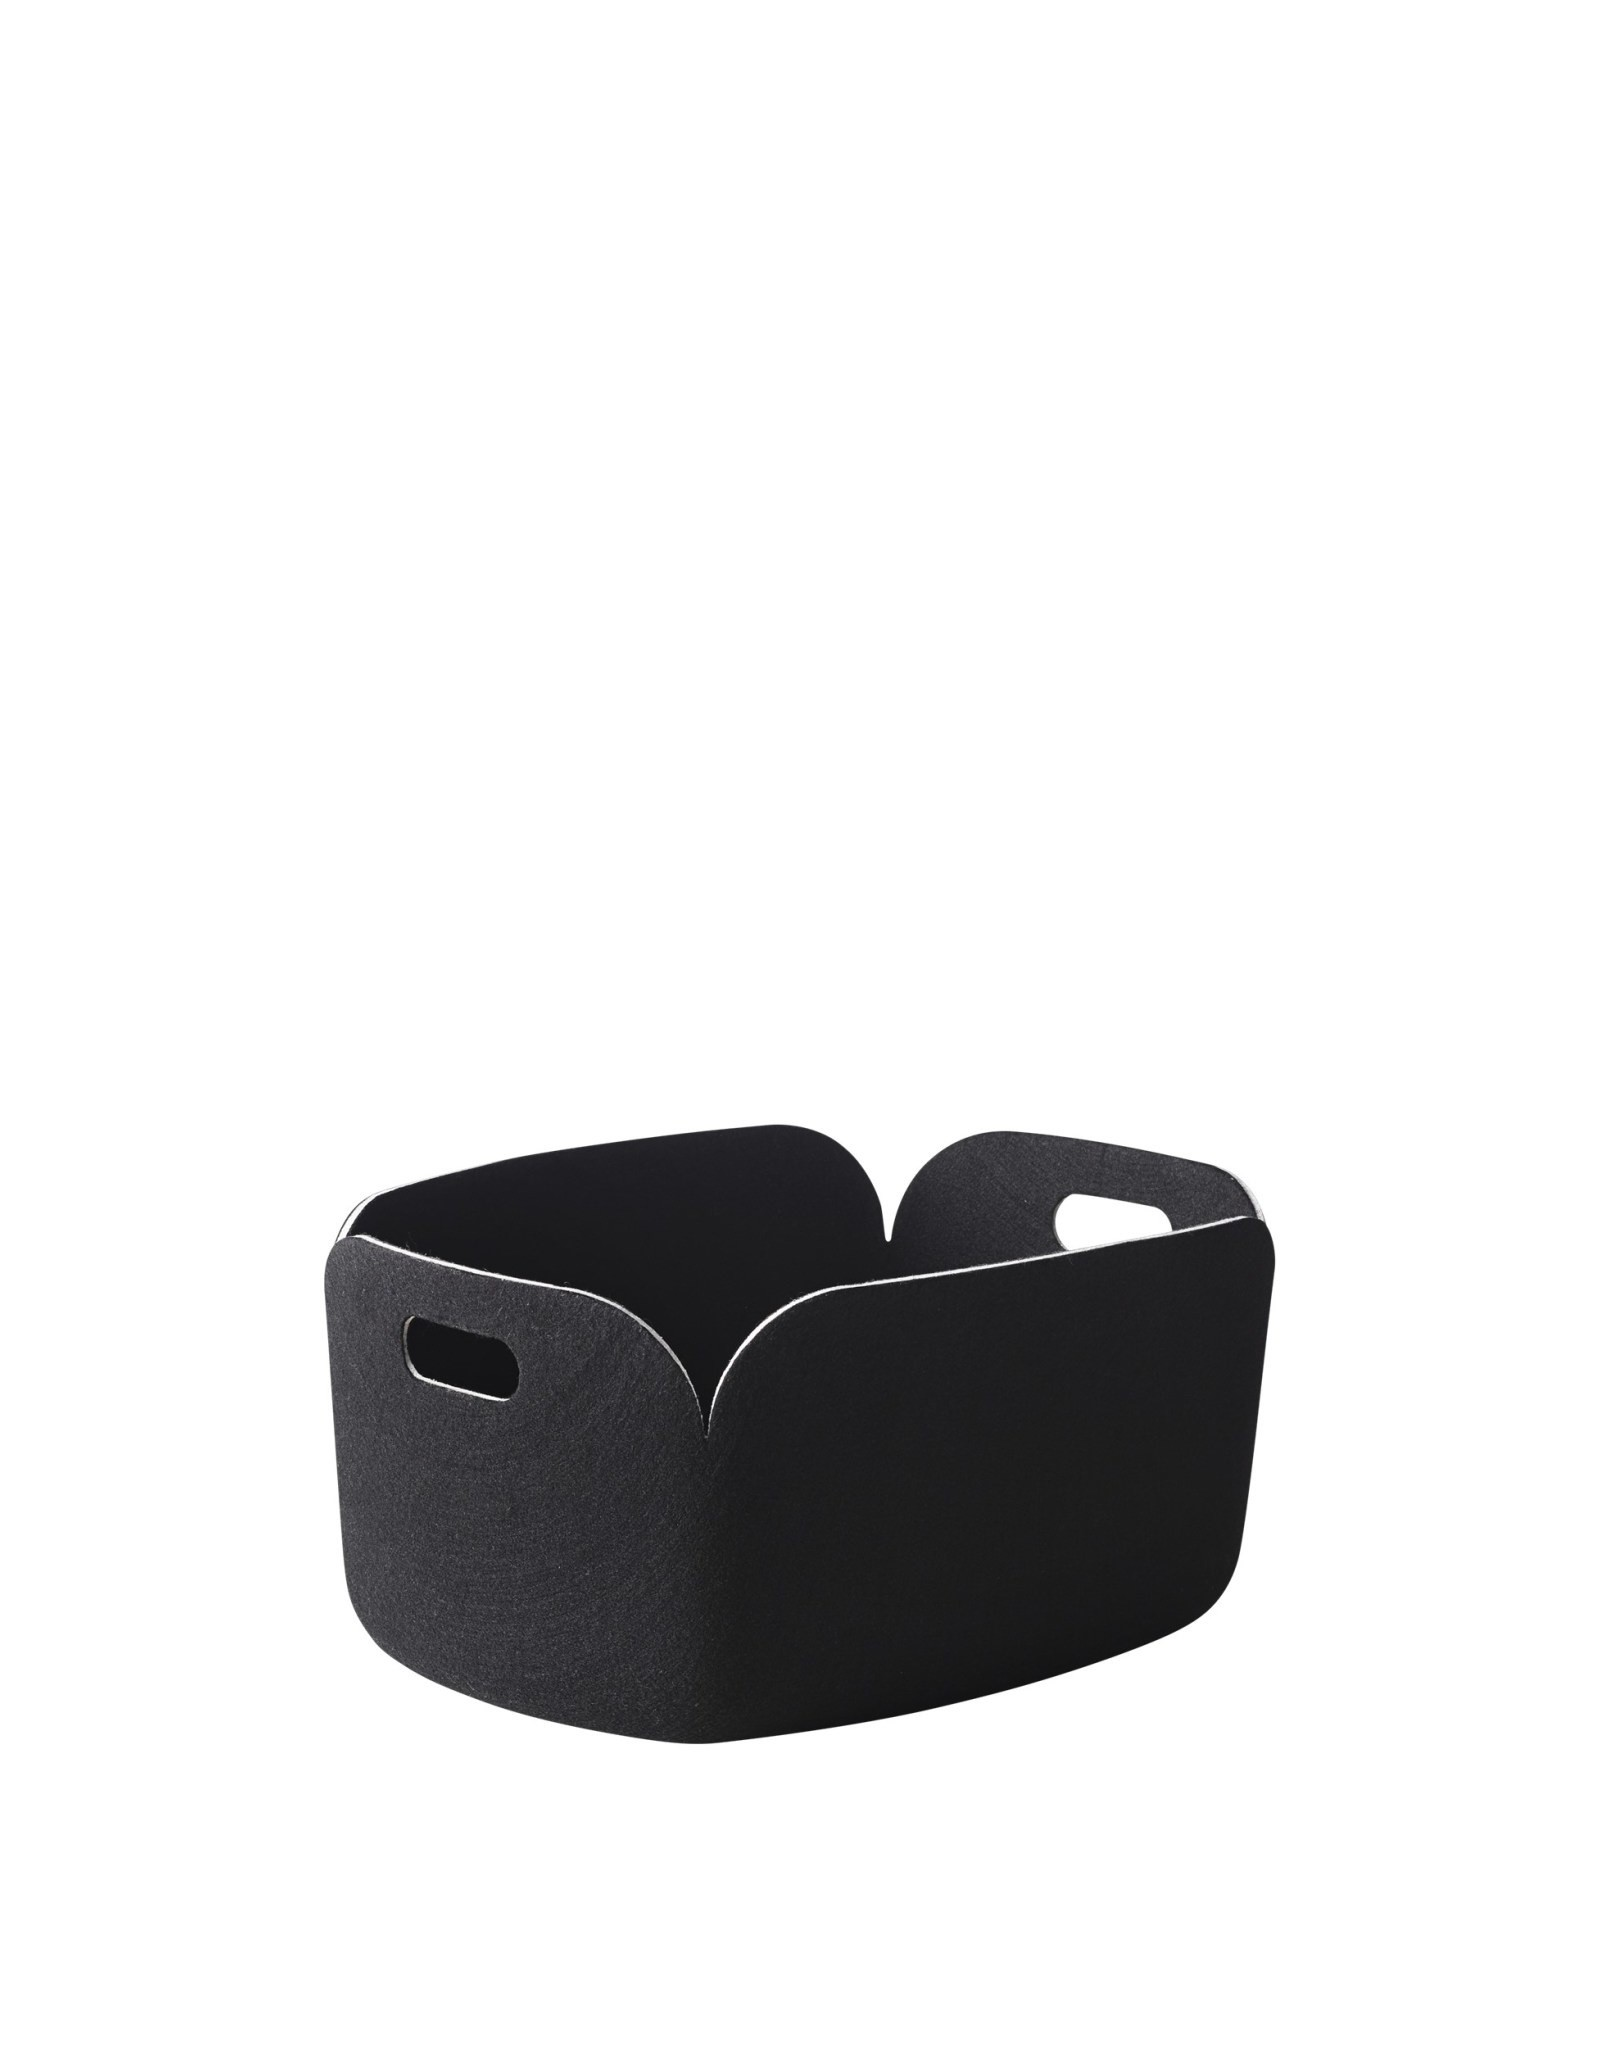 Muuto Muuto Restore basket black